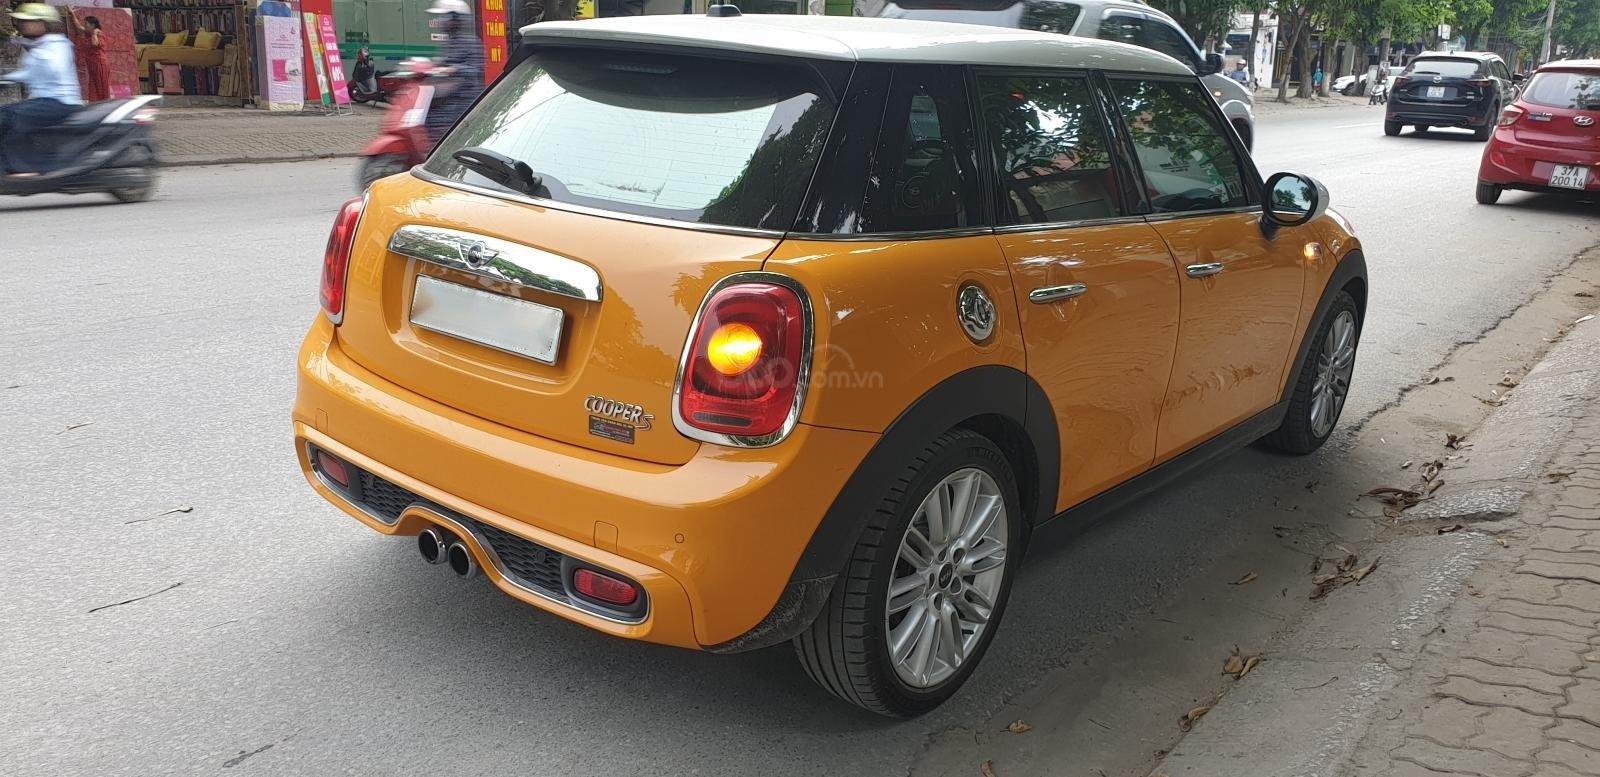 Bán Mini Cooper S model 2016 nhập khẩu-2